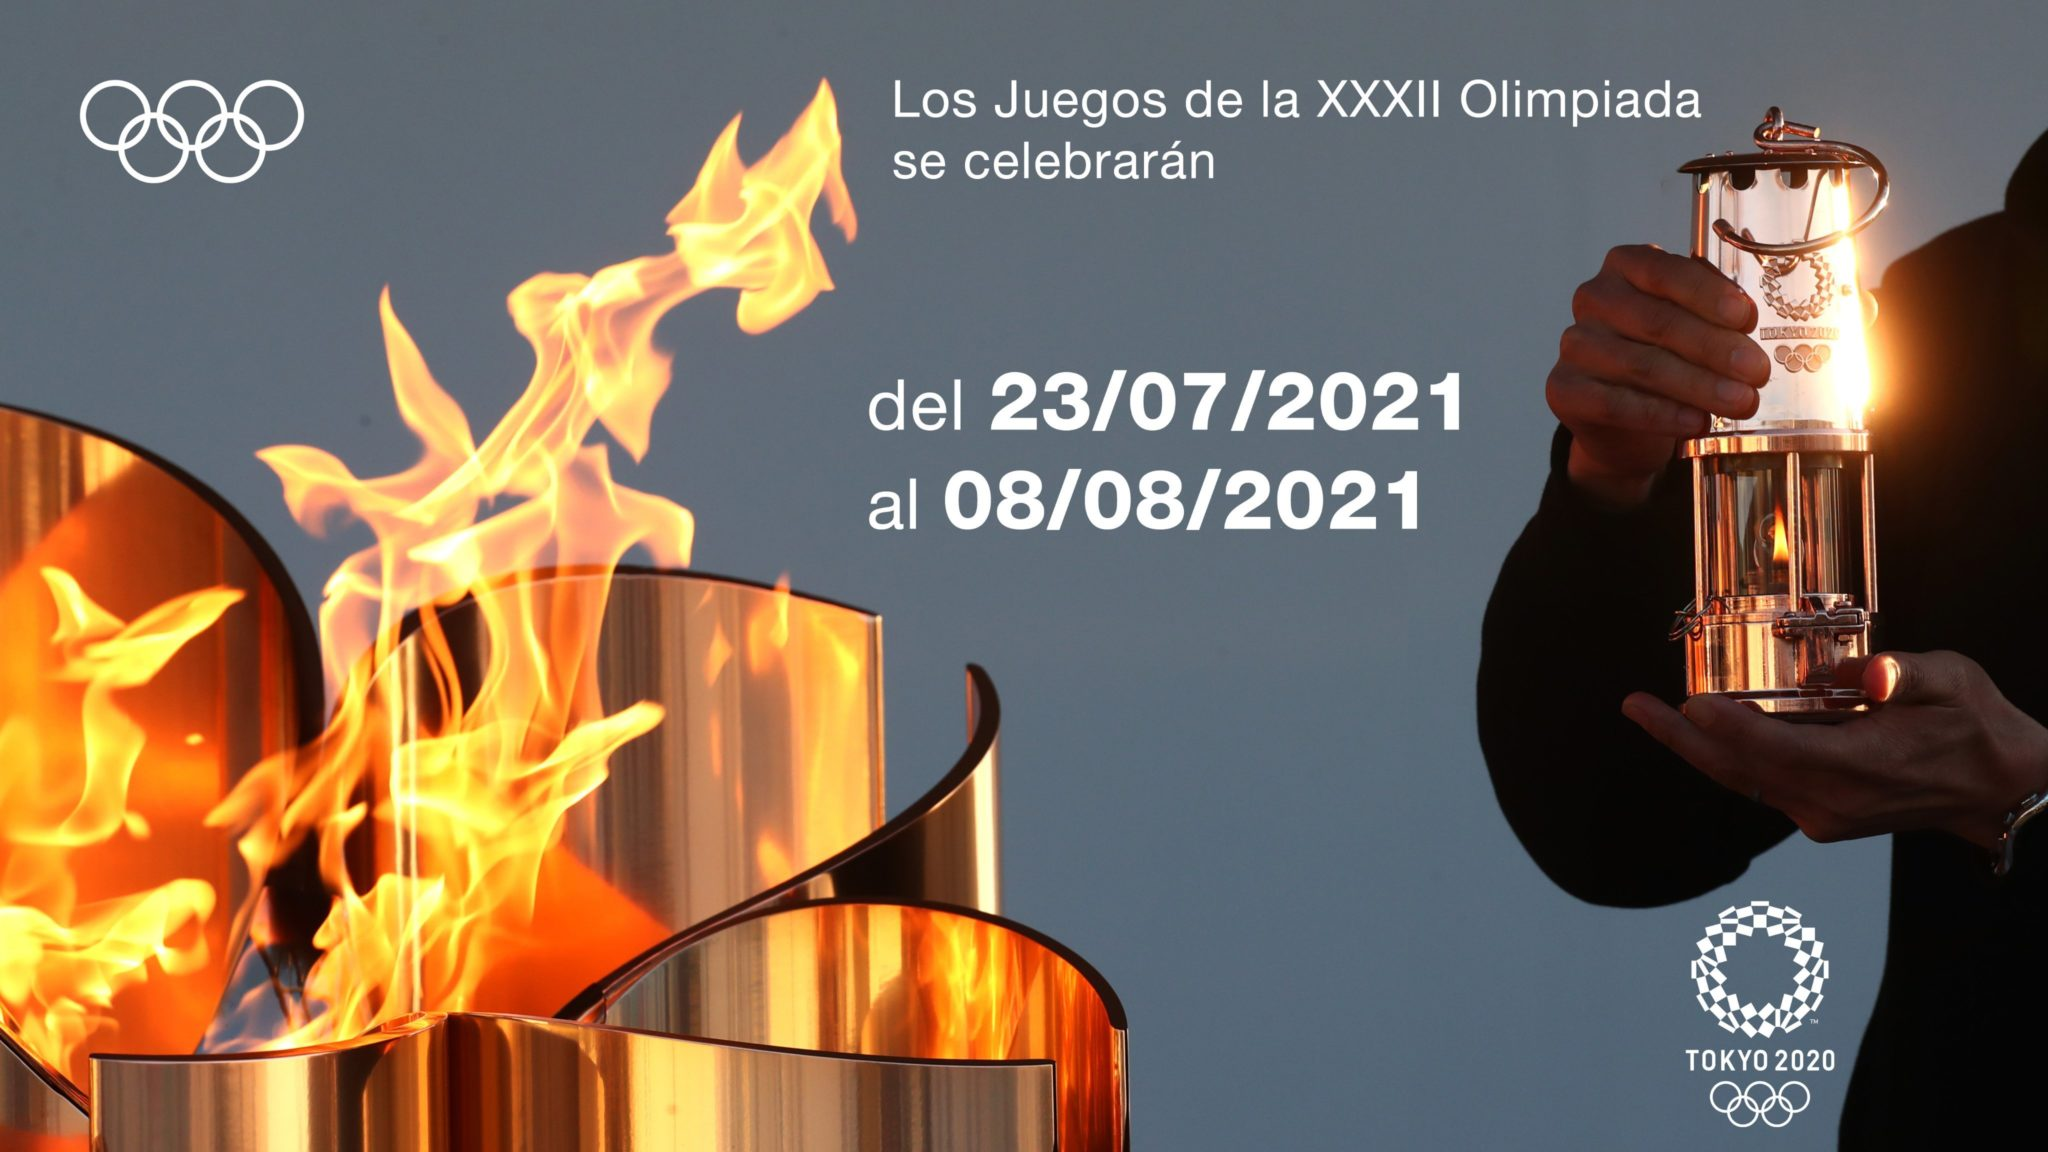 Xogos Olímpicos Toquio 2020 | @juegosolimpicos